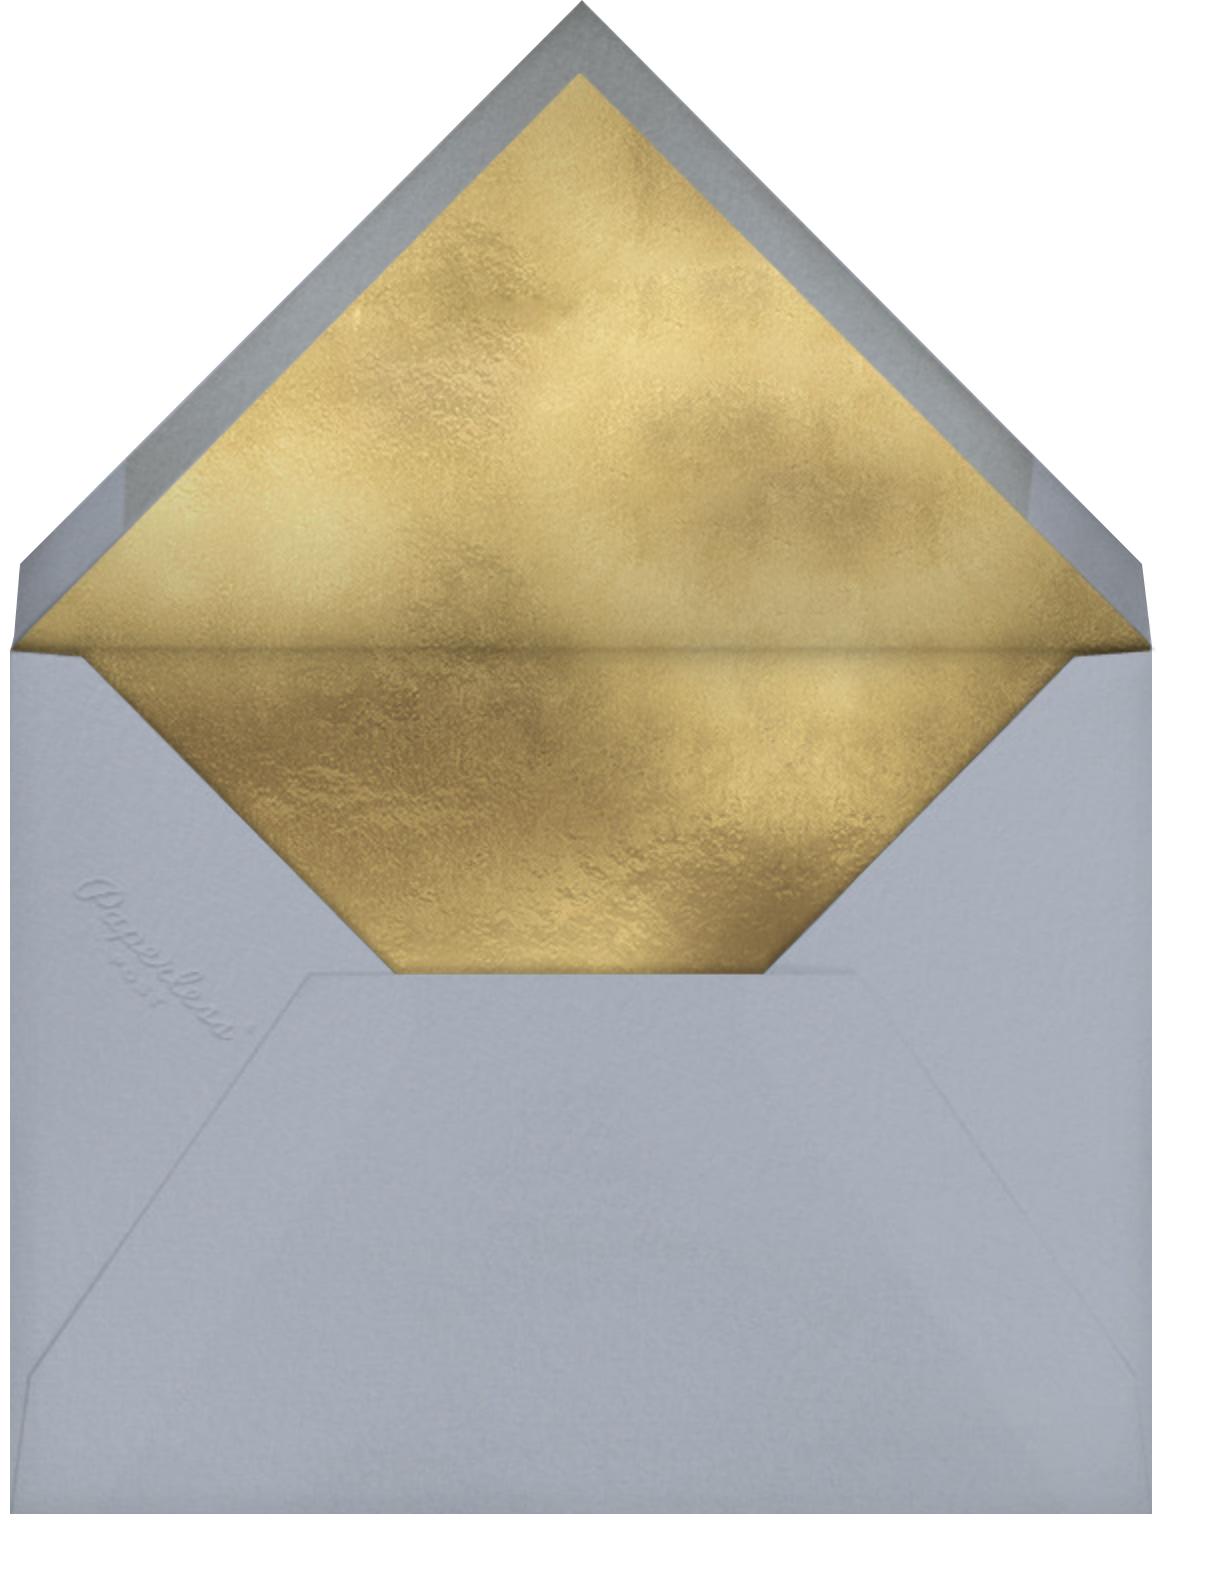 Winter Perennials (Michelle Morin) - Red Cap Cards - Thanksgiving - envelope back